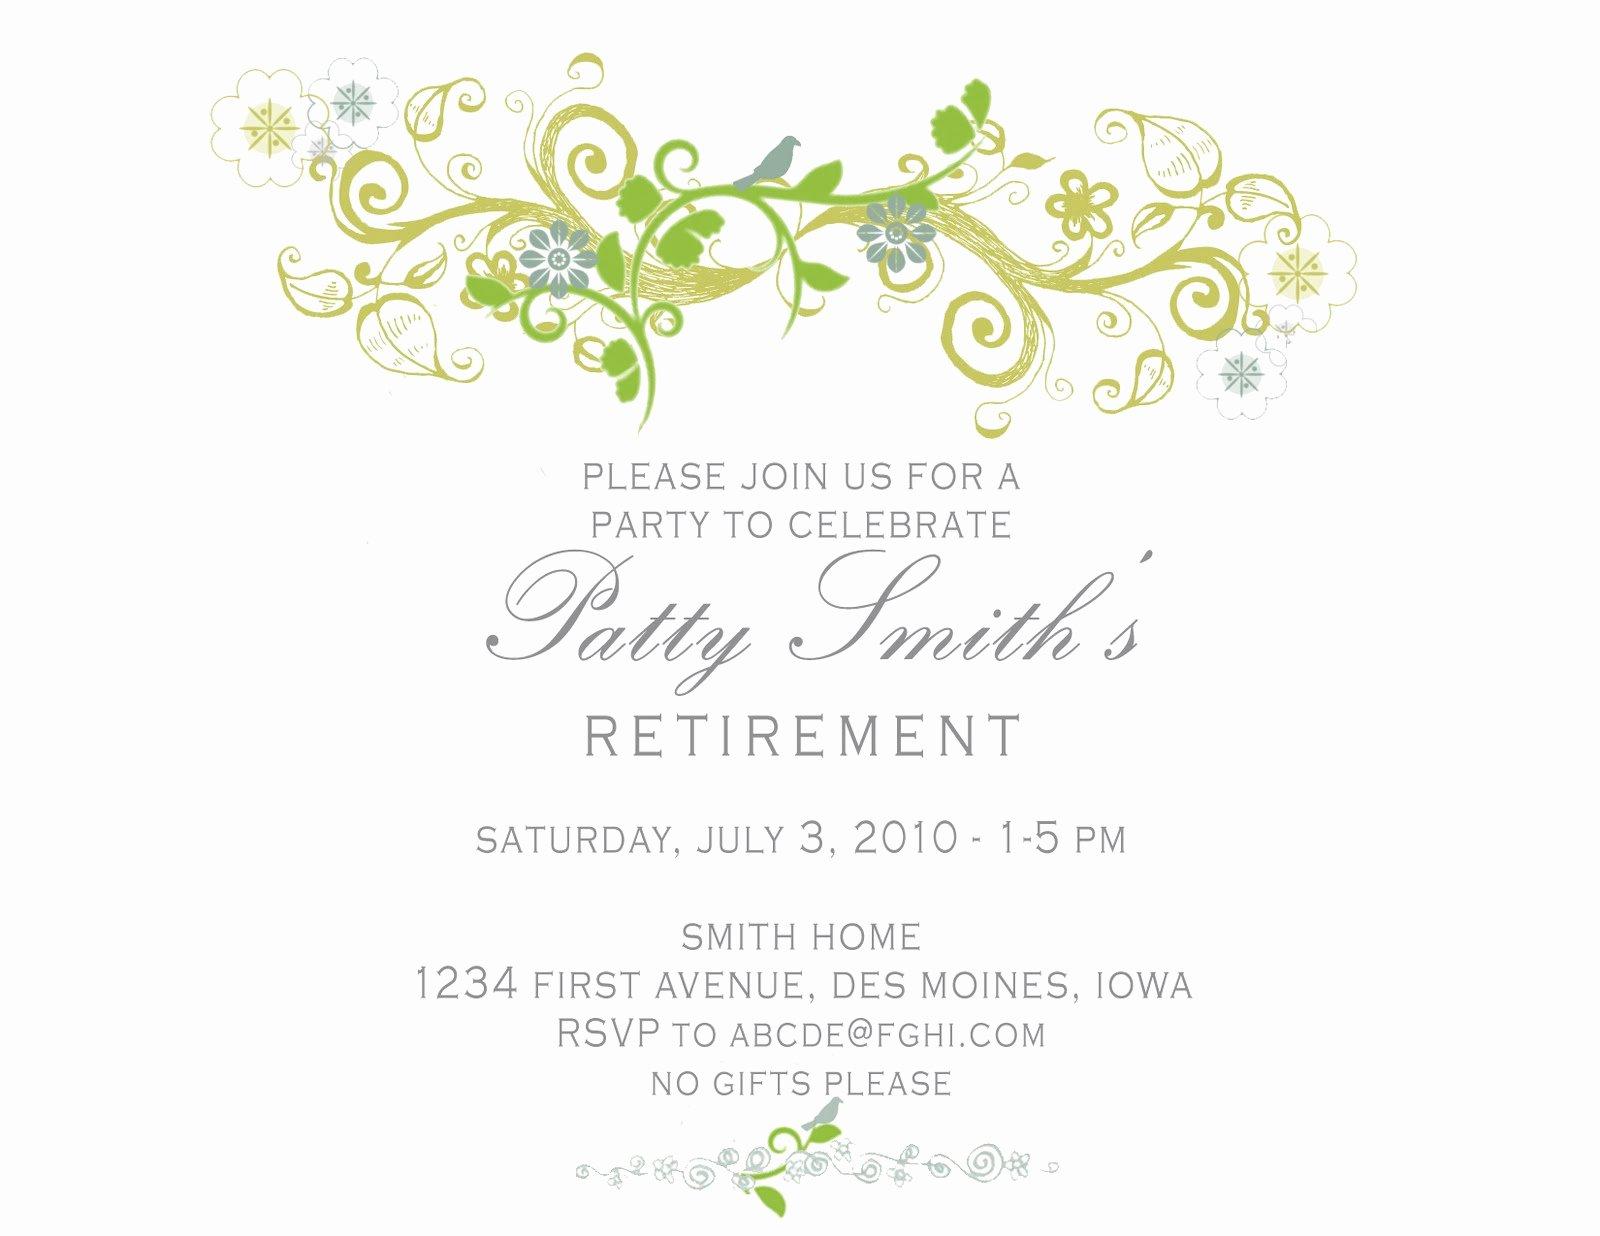 Idesign A Retirement Party Invitation